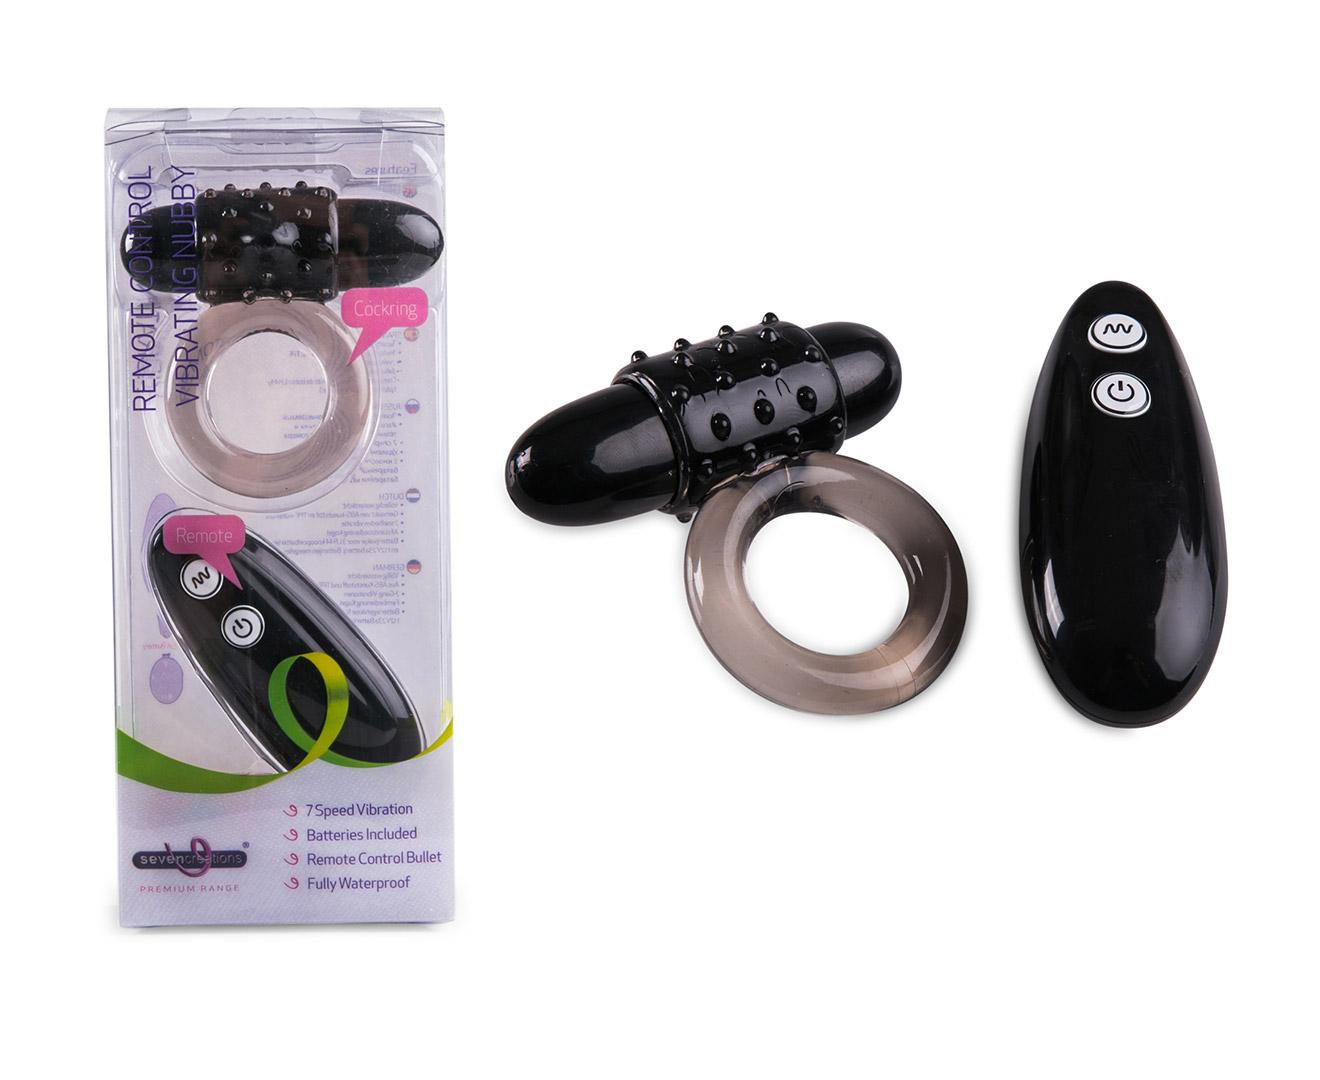 Remote Control Vibrating Nubby Cockring - Black | Catch.com.au